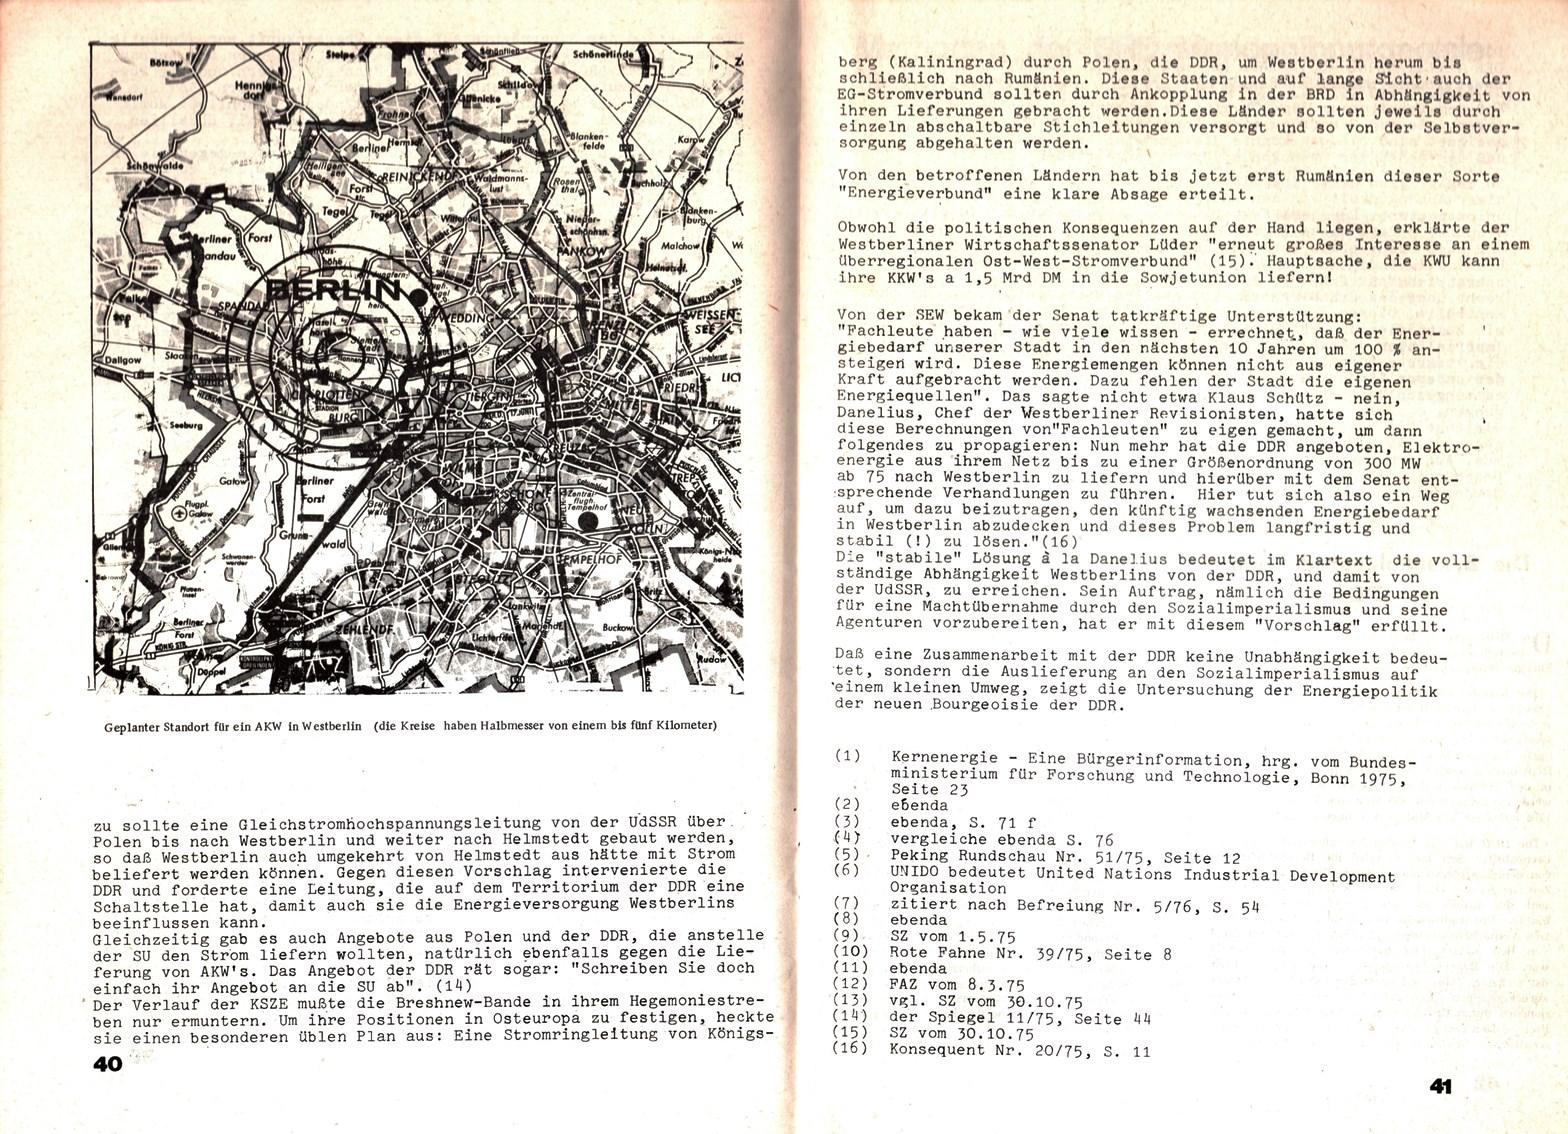 KSV_1976_Atomenergie_im_Kapitalismus_022